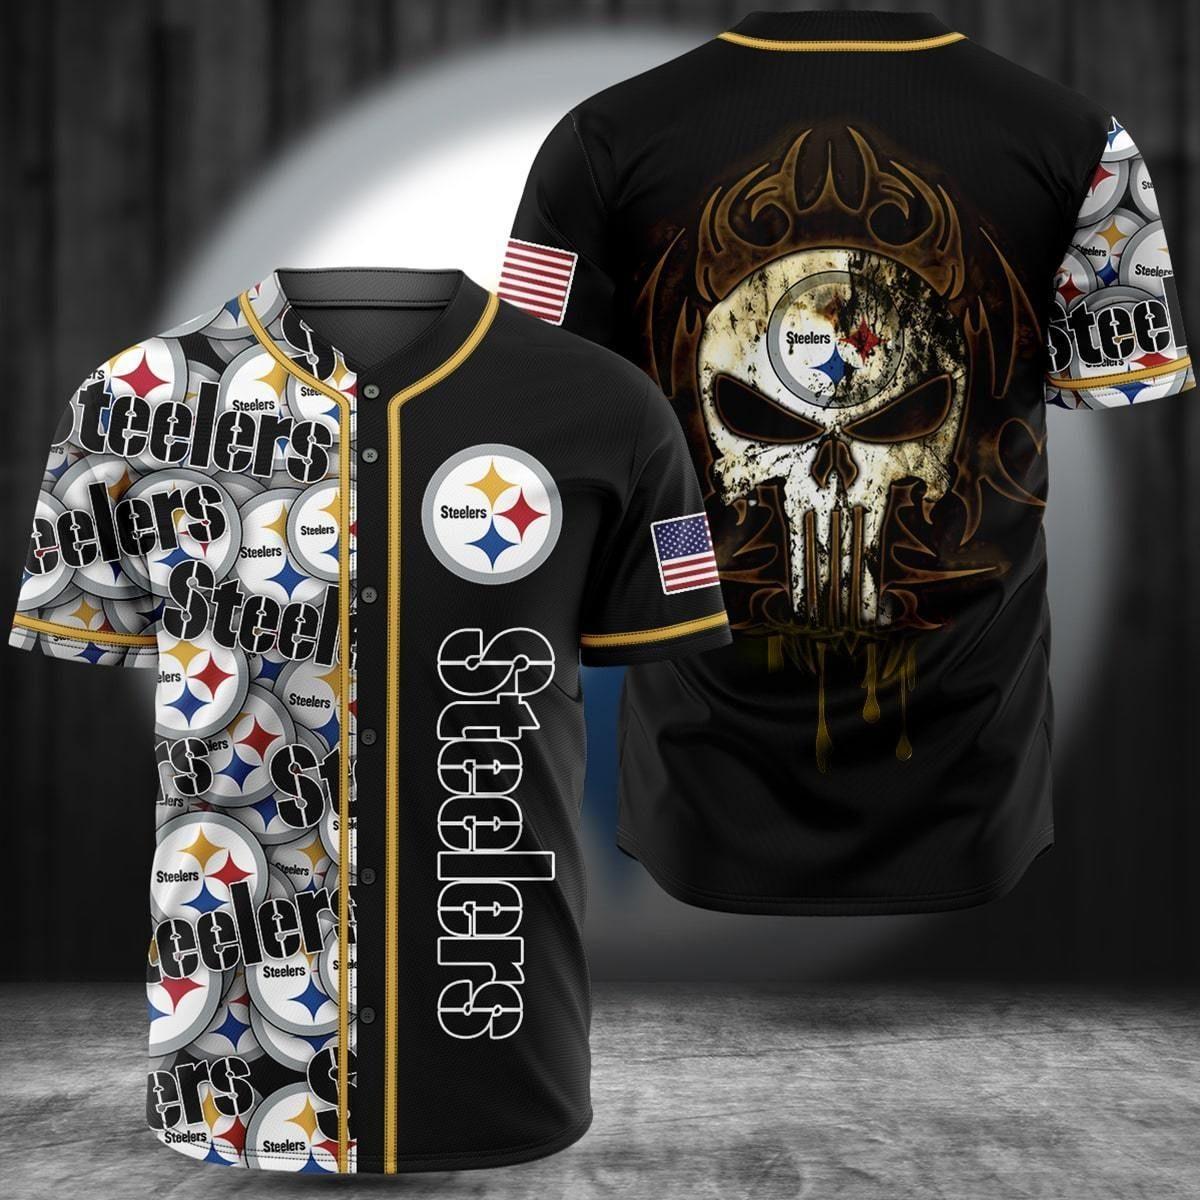 Pittsburgh steelers punisher skull jersey shirt